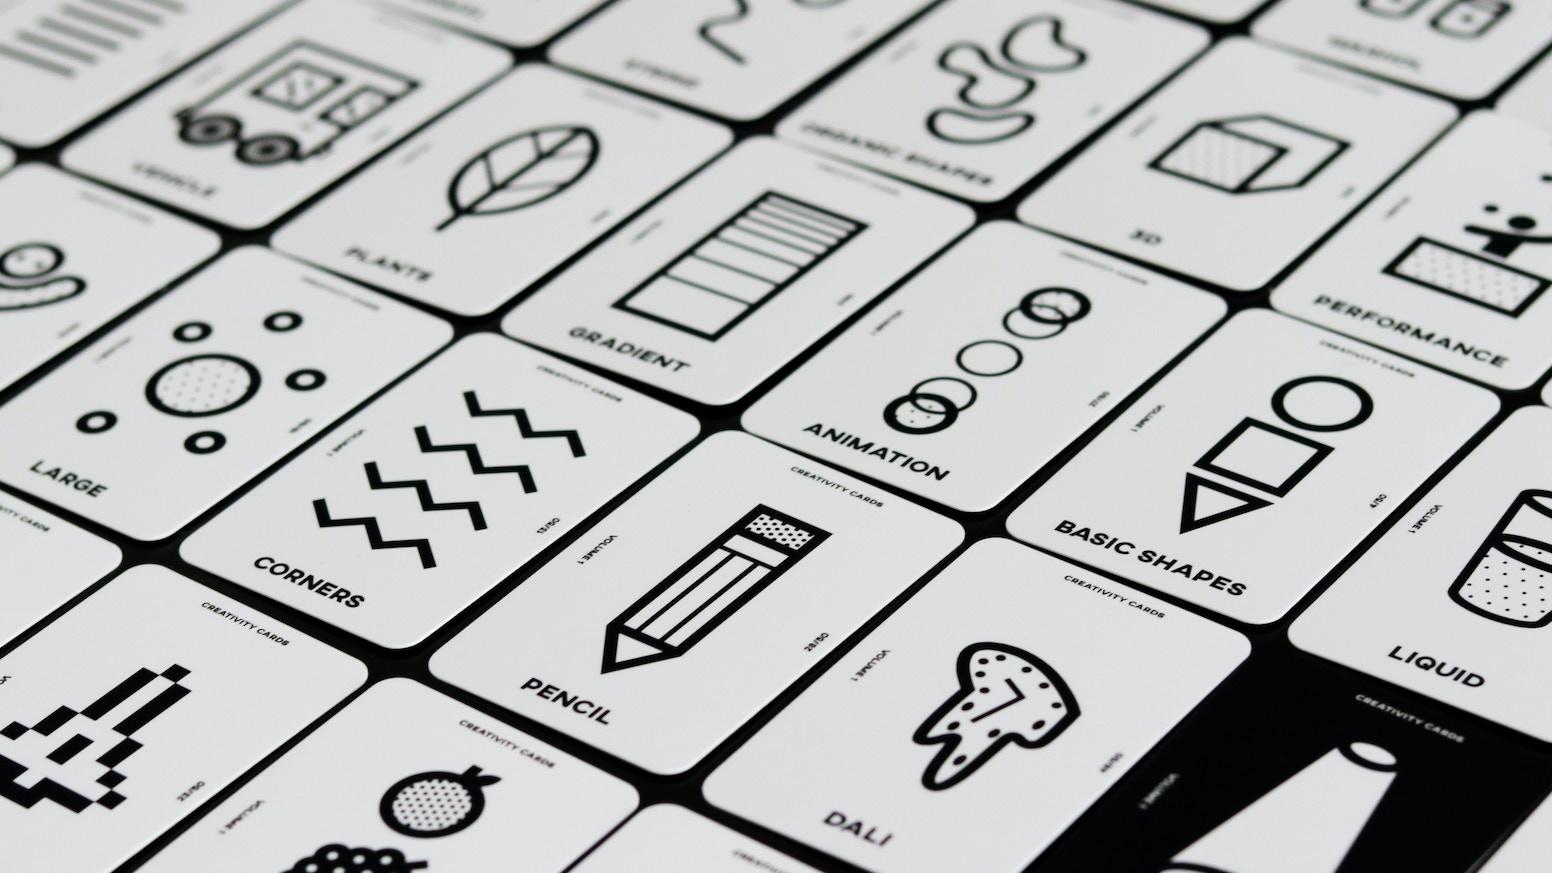 The Game Of Creativity By Matt Vojacek Kickstarter